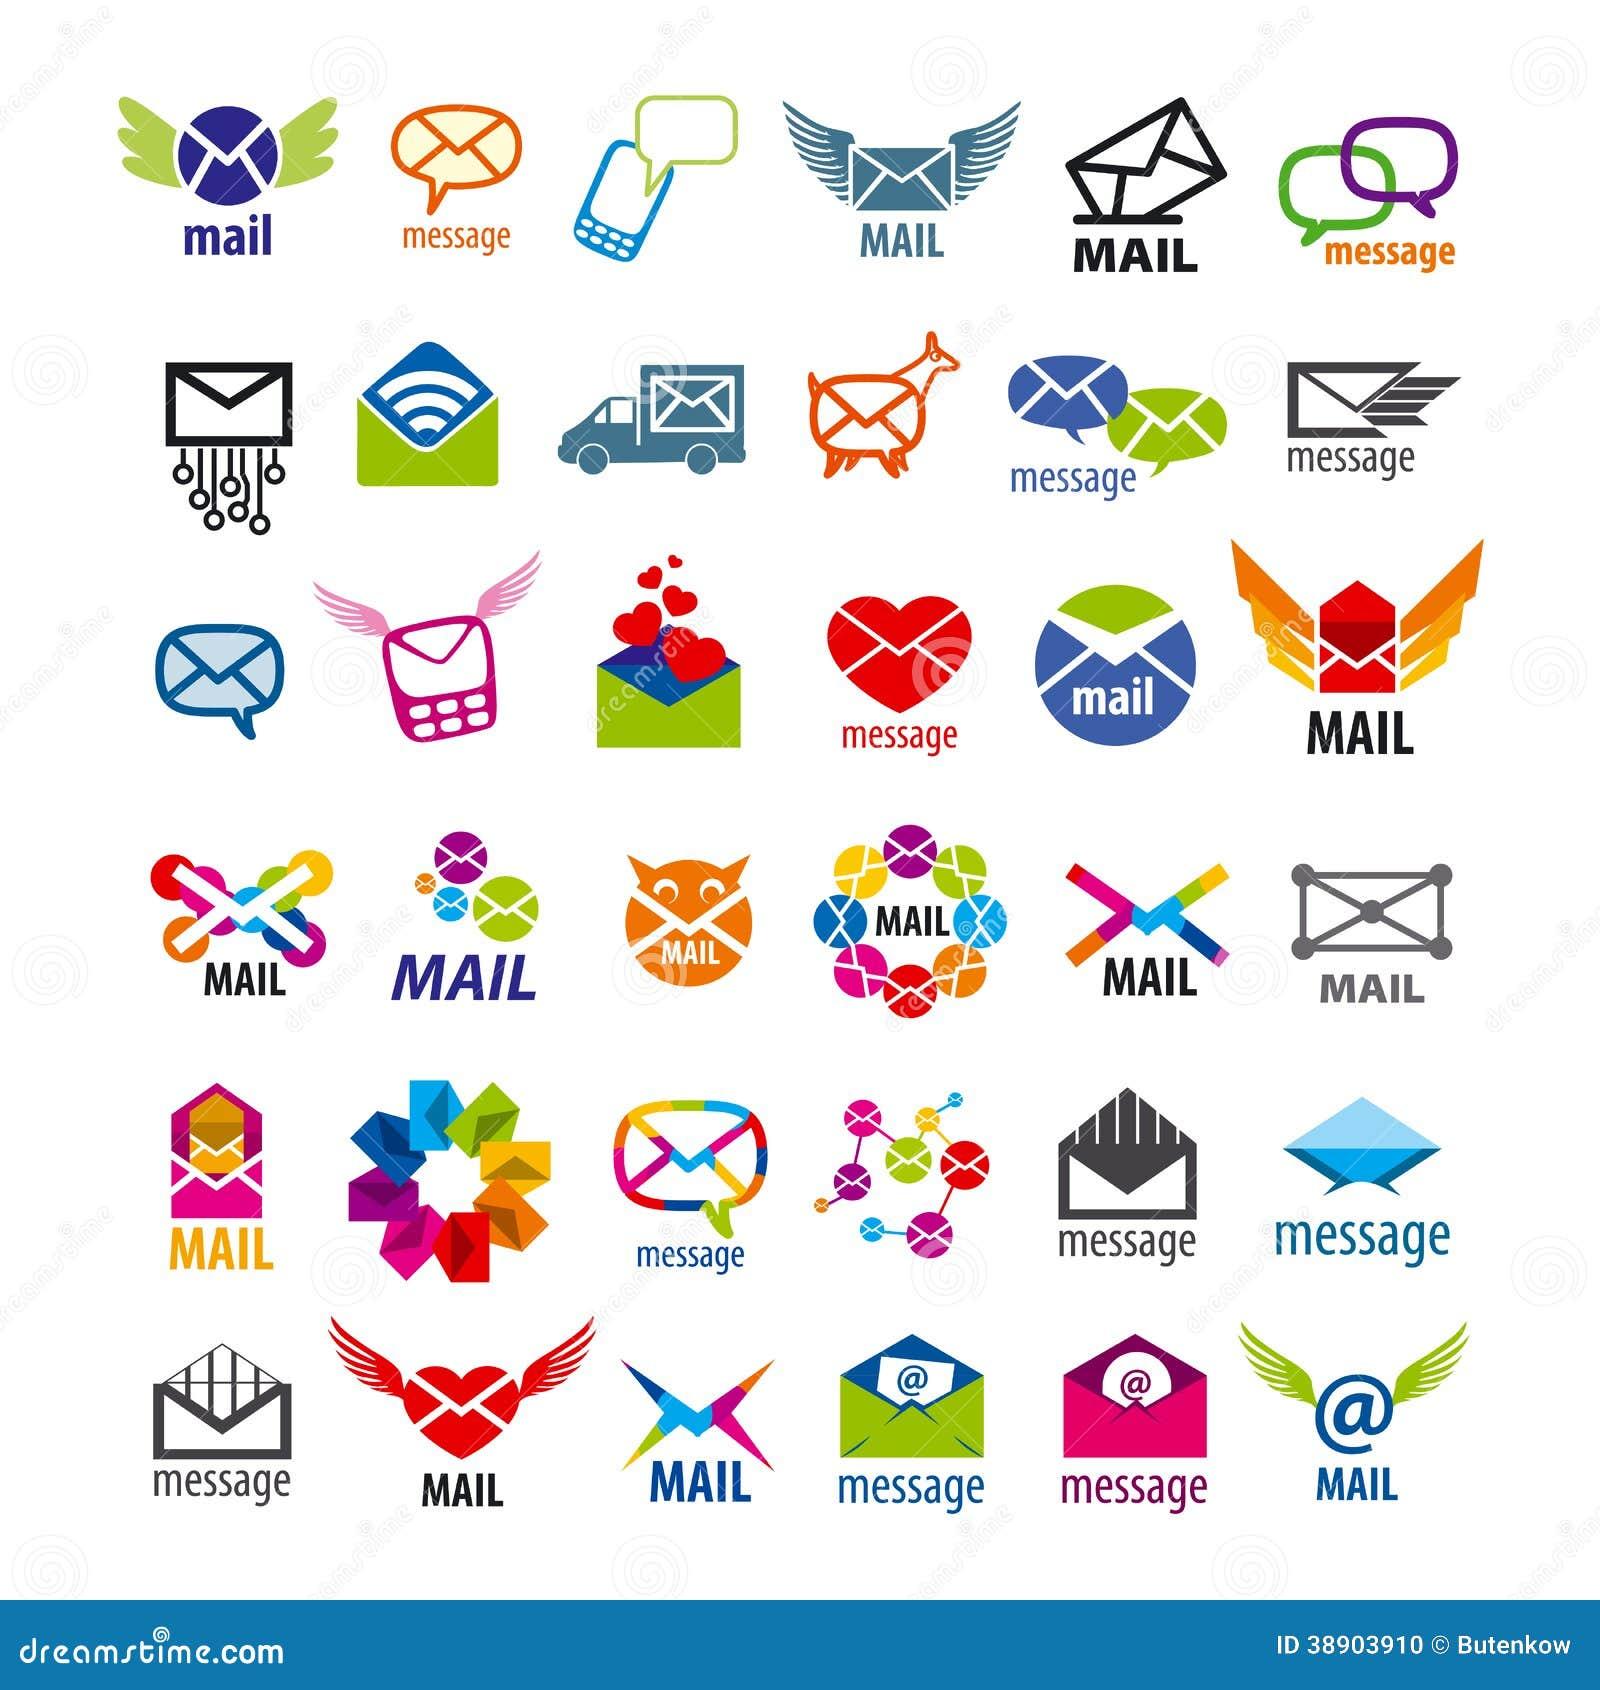 Book logos stock vector image 42714029 - Mensagens Do Correio Dos Logotipos Do Vetor Foto De Stock